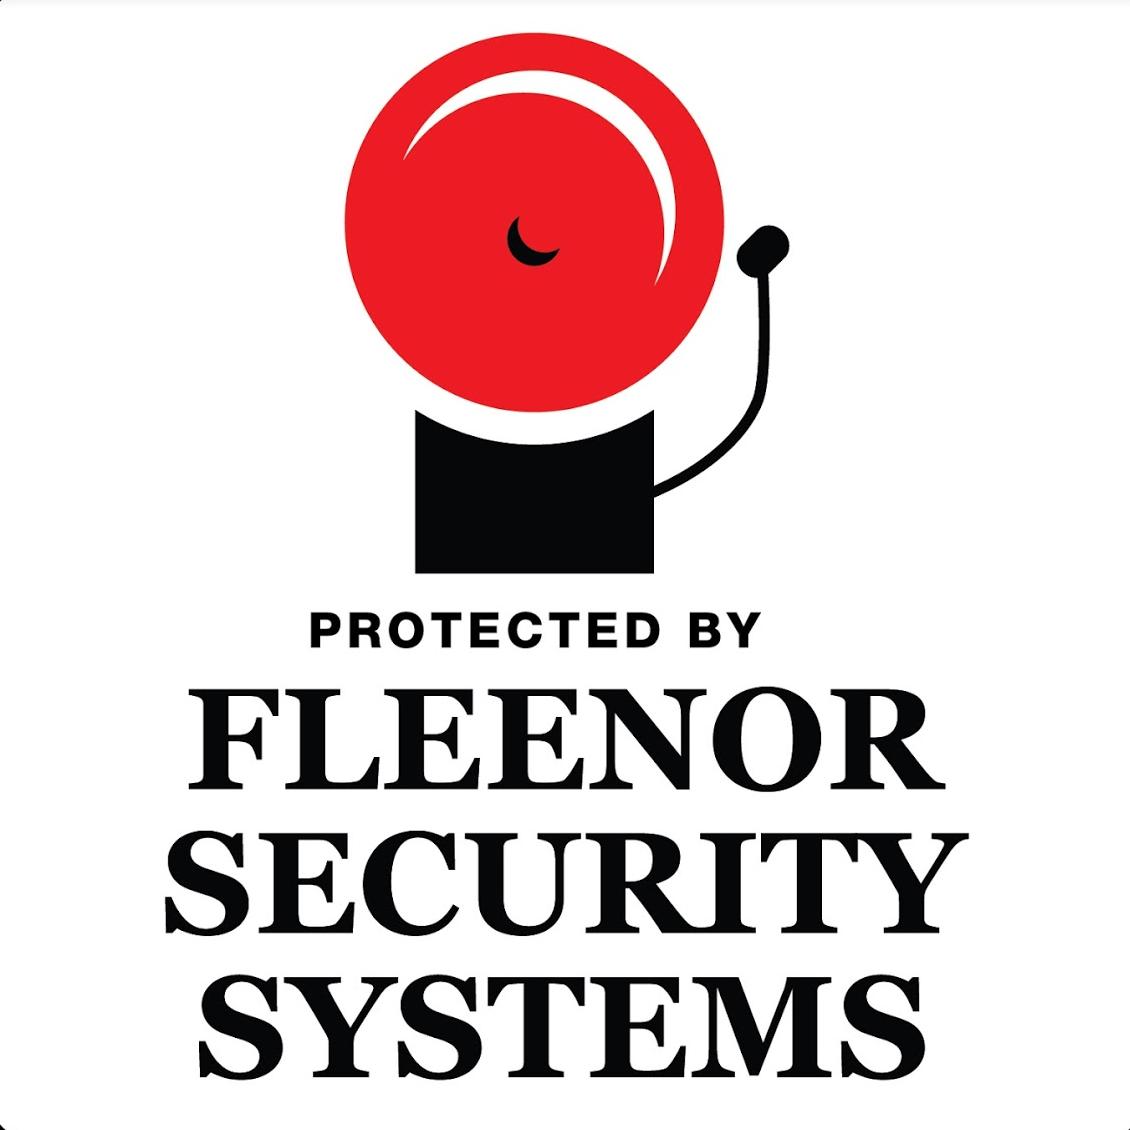 Fleenor Security Systems